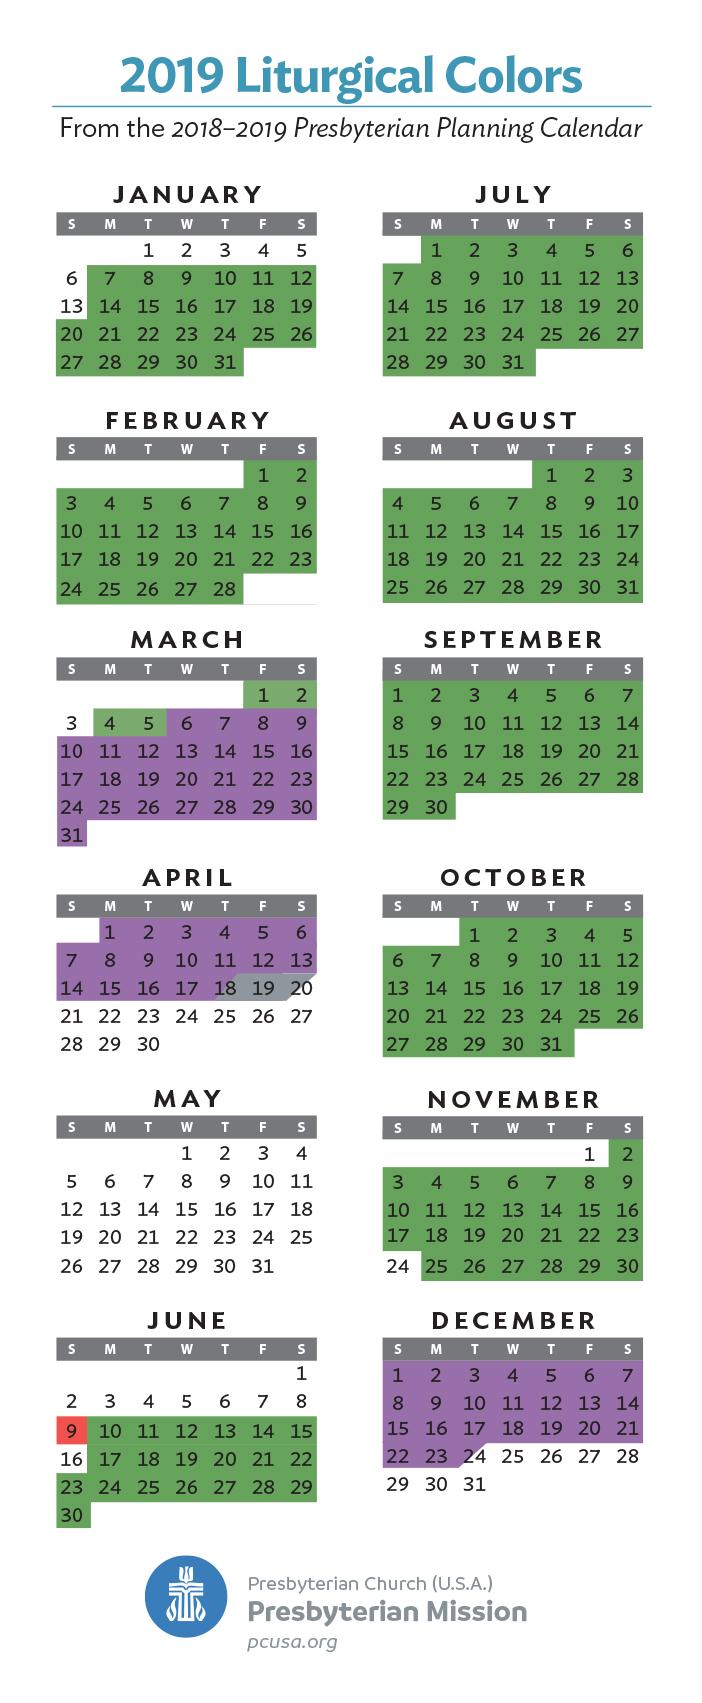 January 7, 2019 Liturgical Calendar 2019 Liturgical Colors   Presbytery of St. Augustine